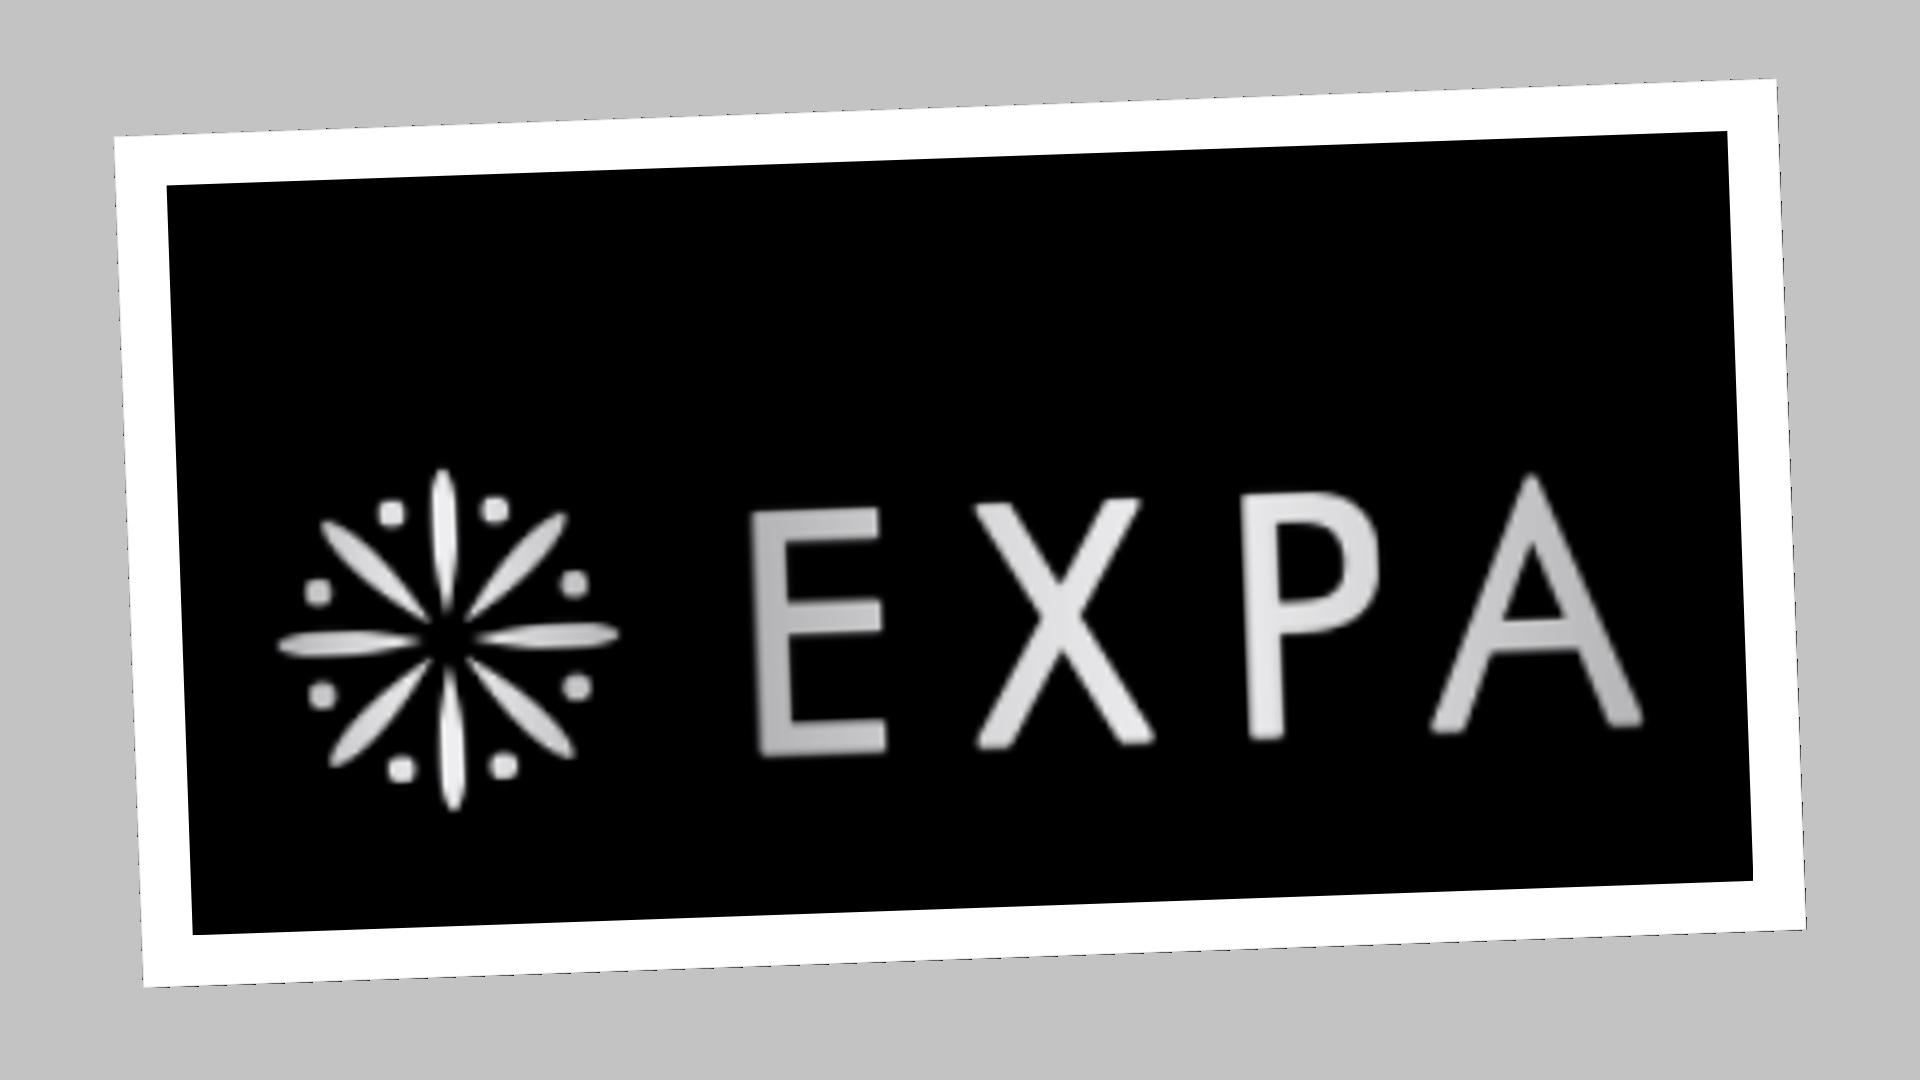 expa評判